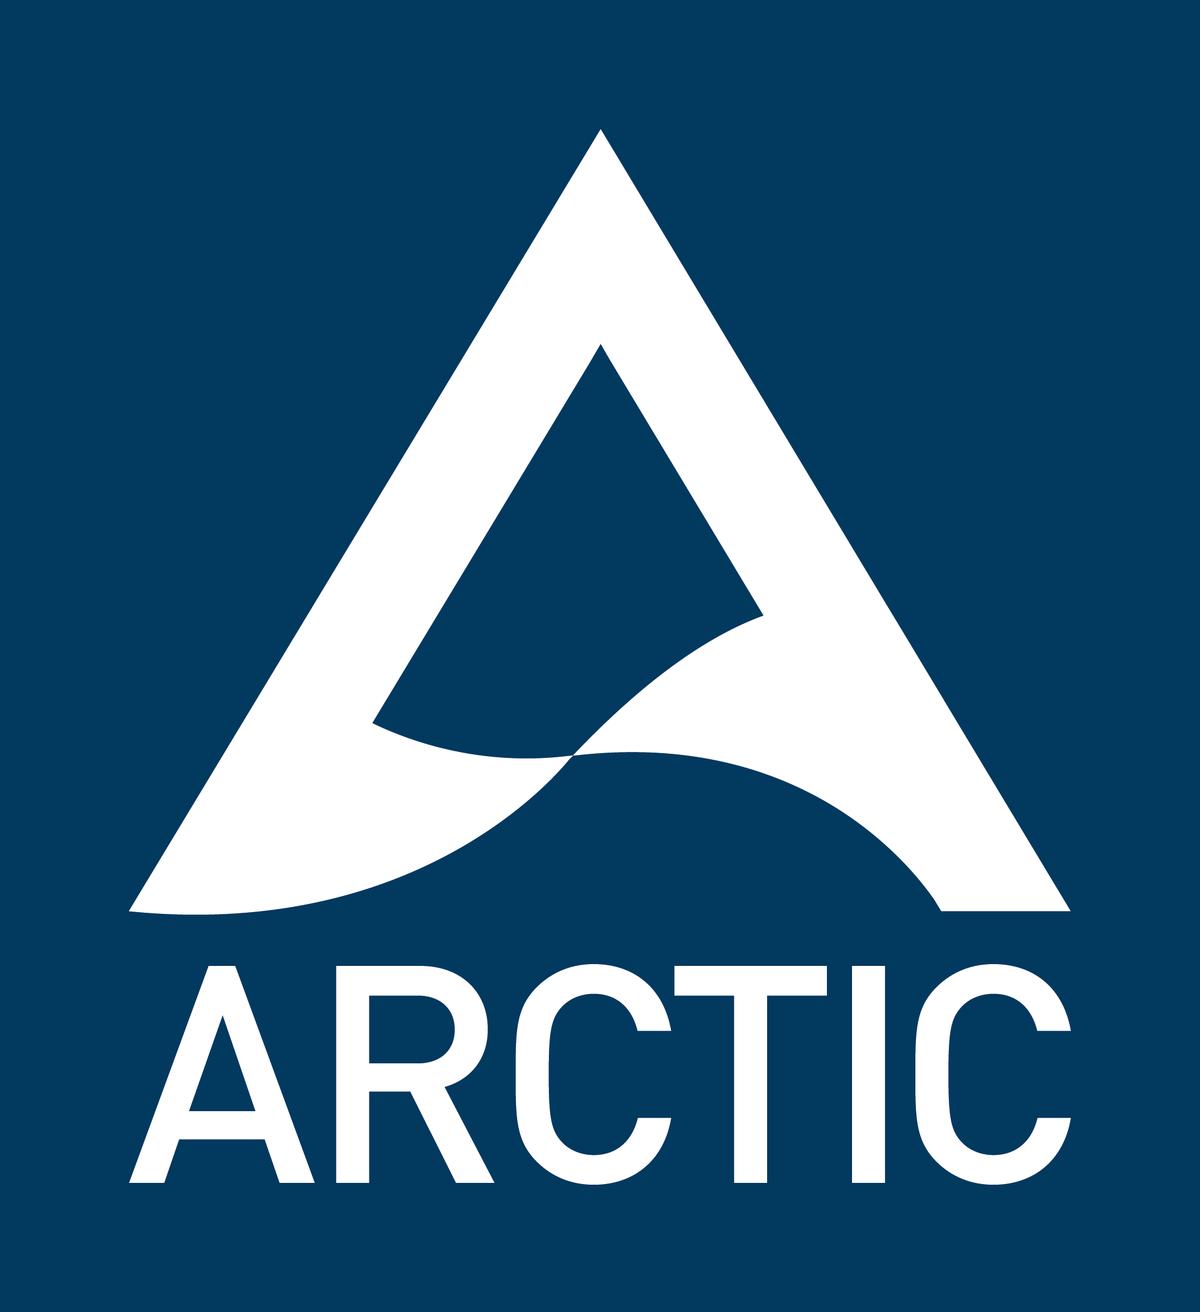 Arctic (company)